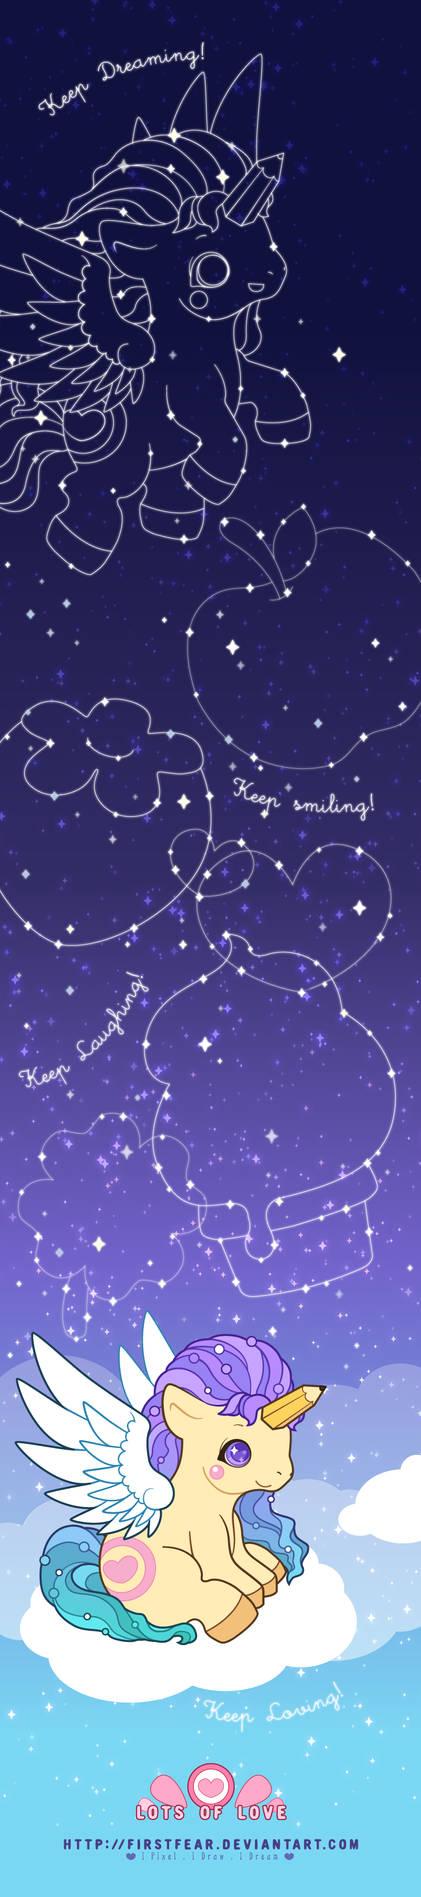 Vector - Keep Dreaming